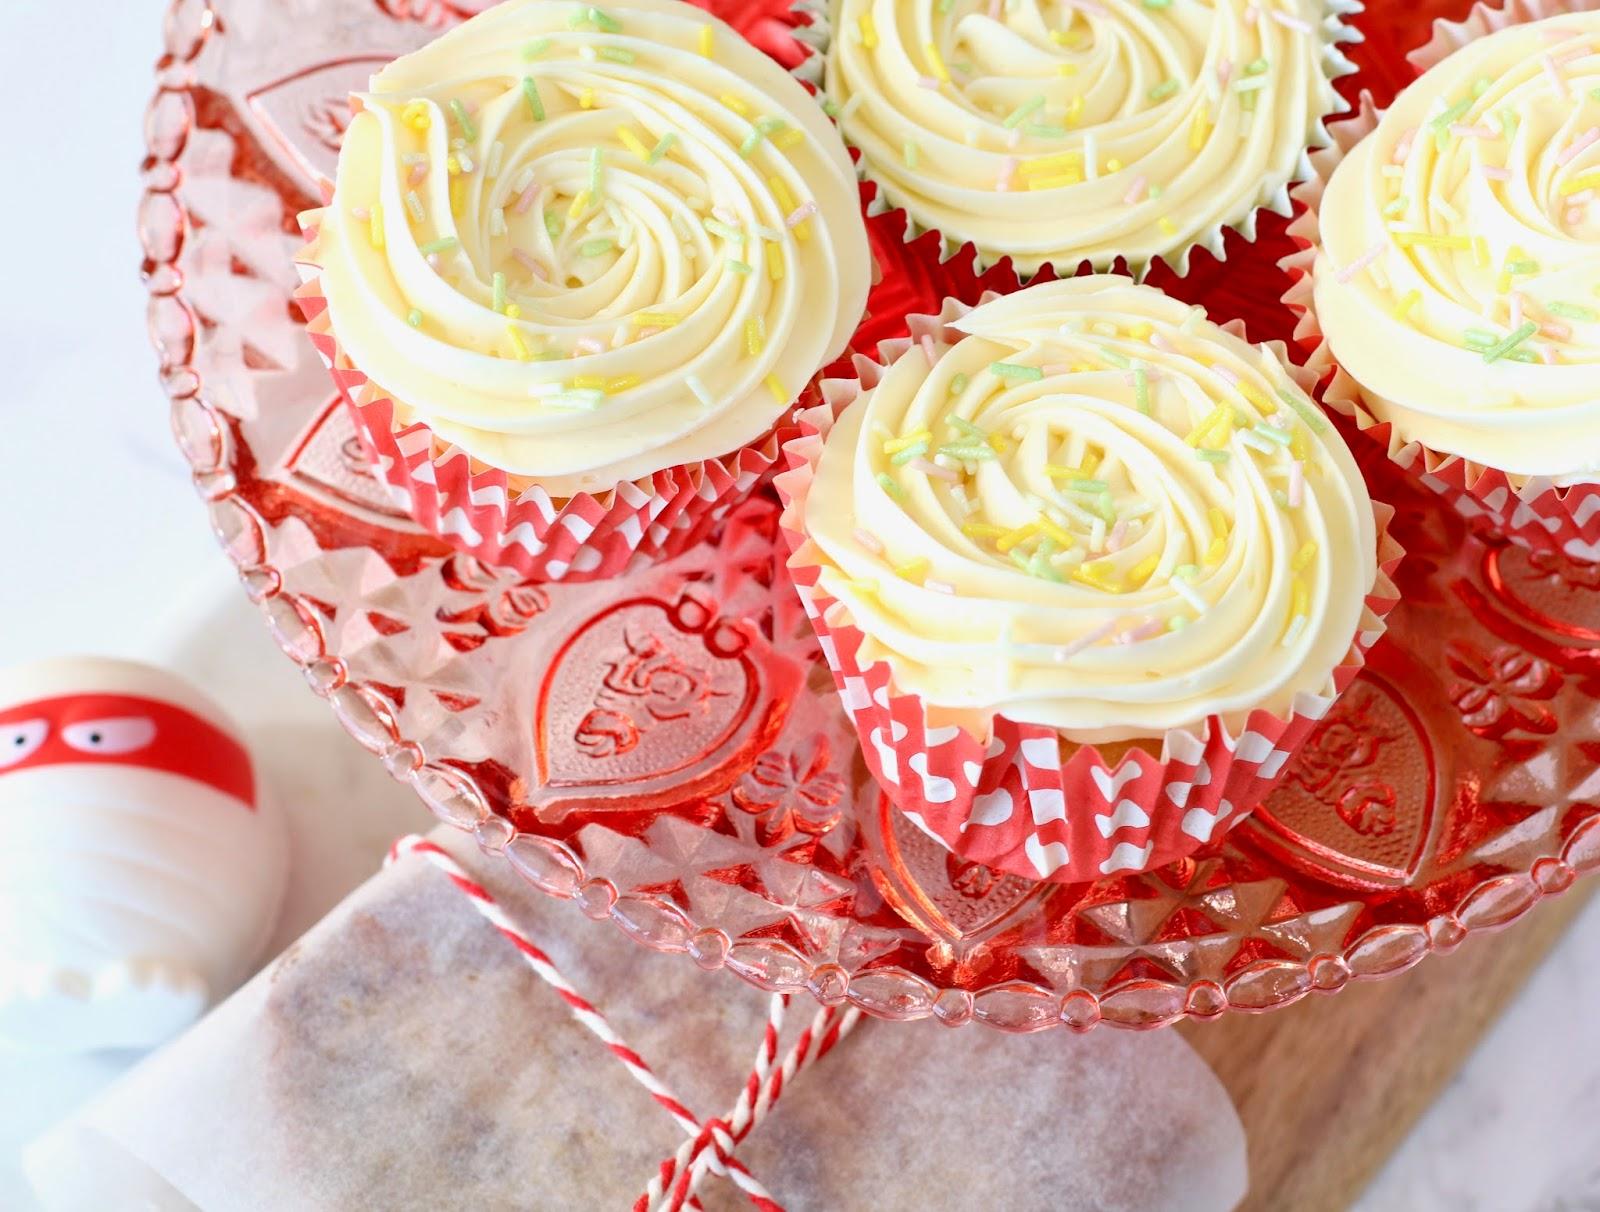 Red Nose Day Bake Sale Ideas vanilla cupcakes banana bread